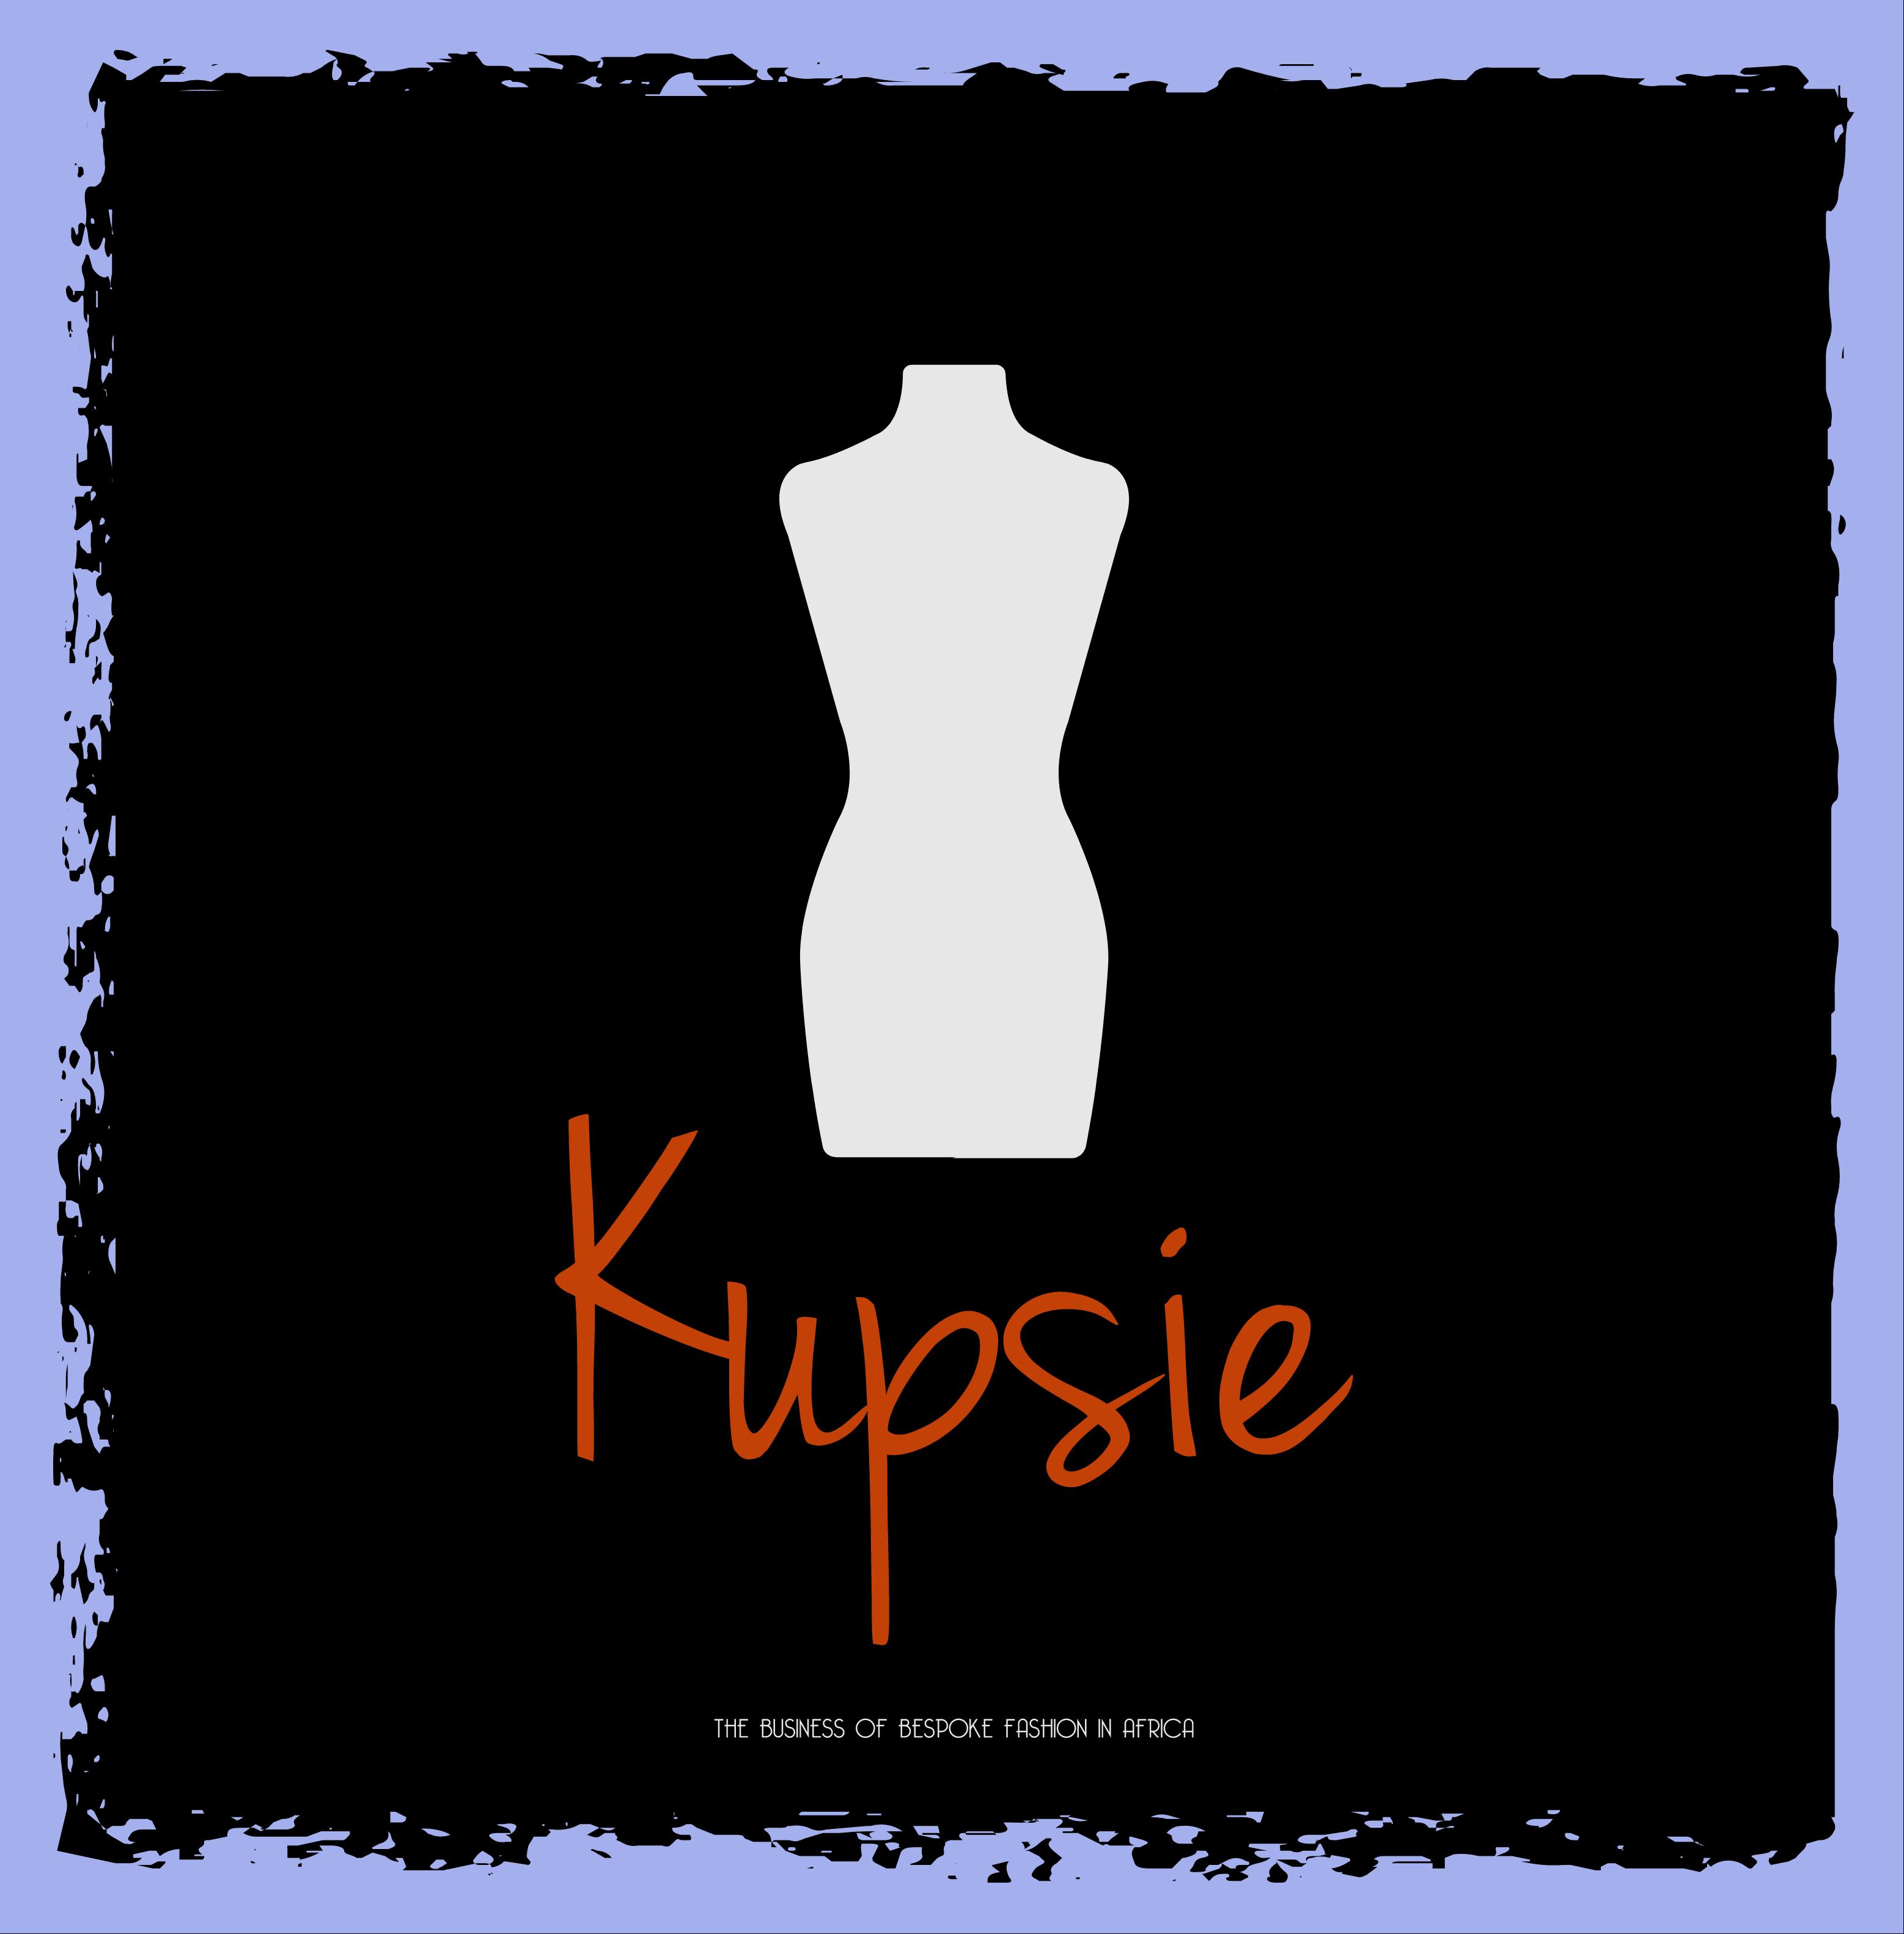 Kupsie.com